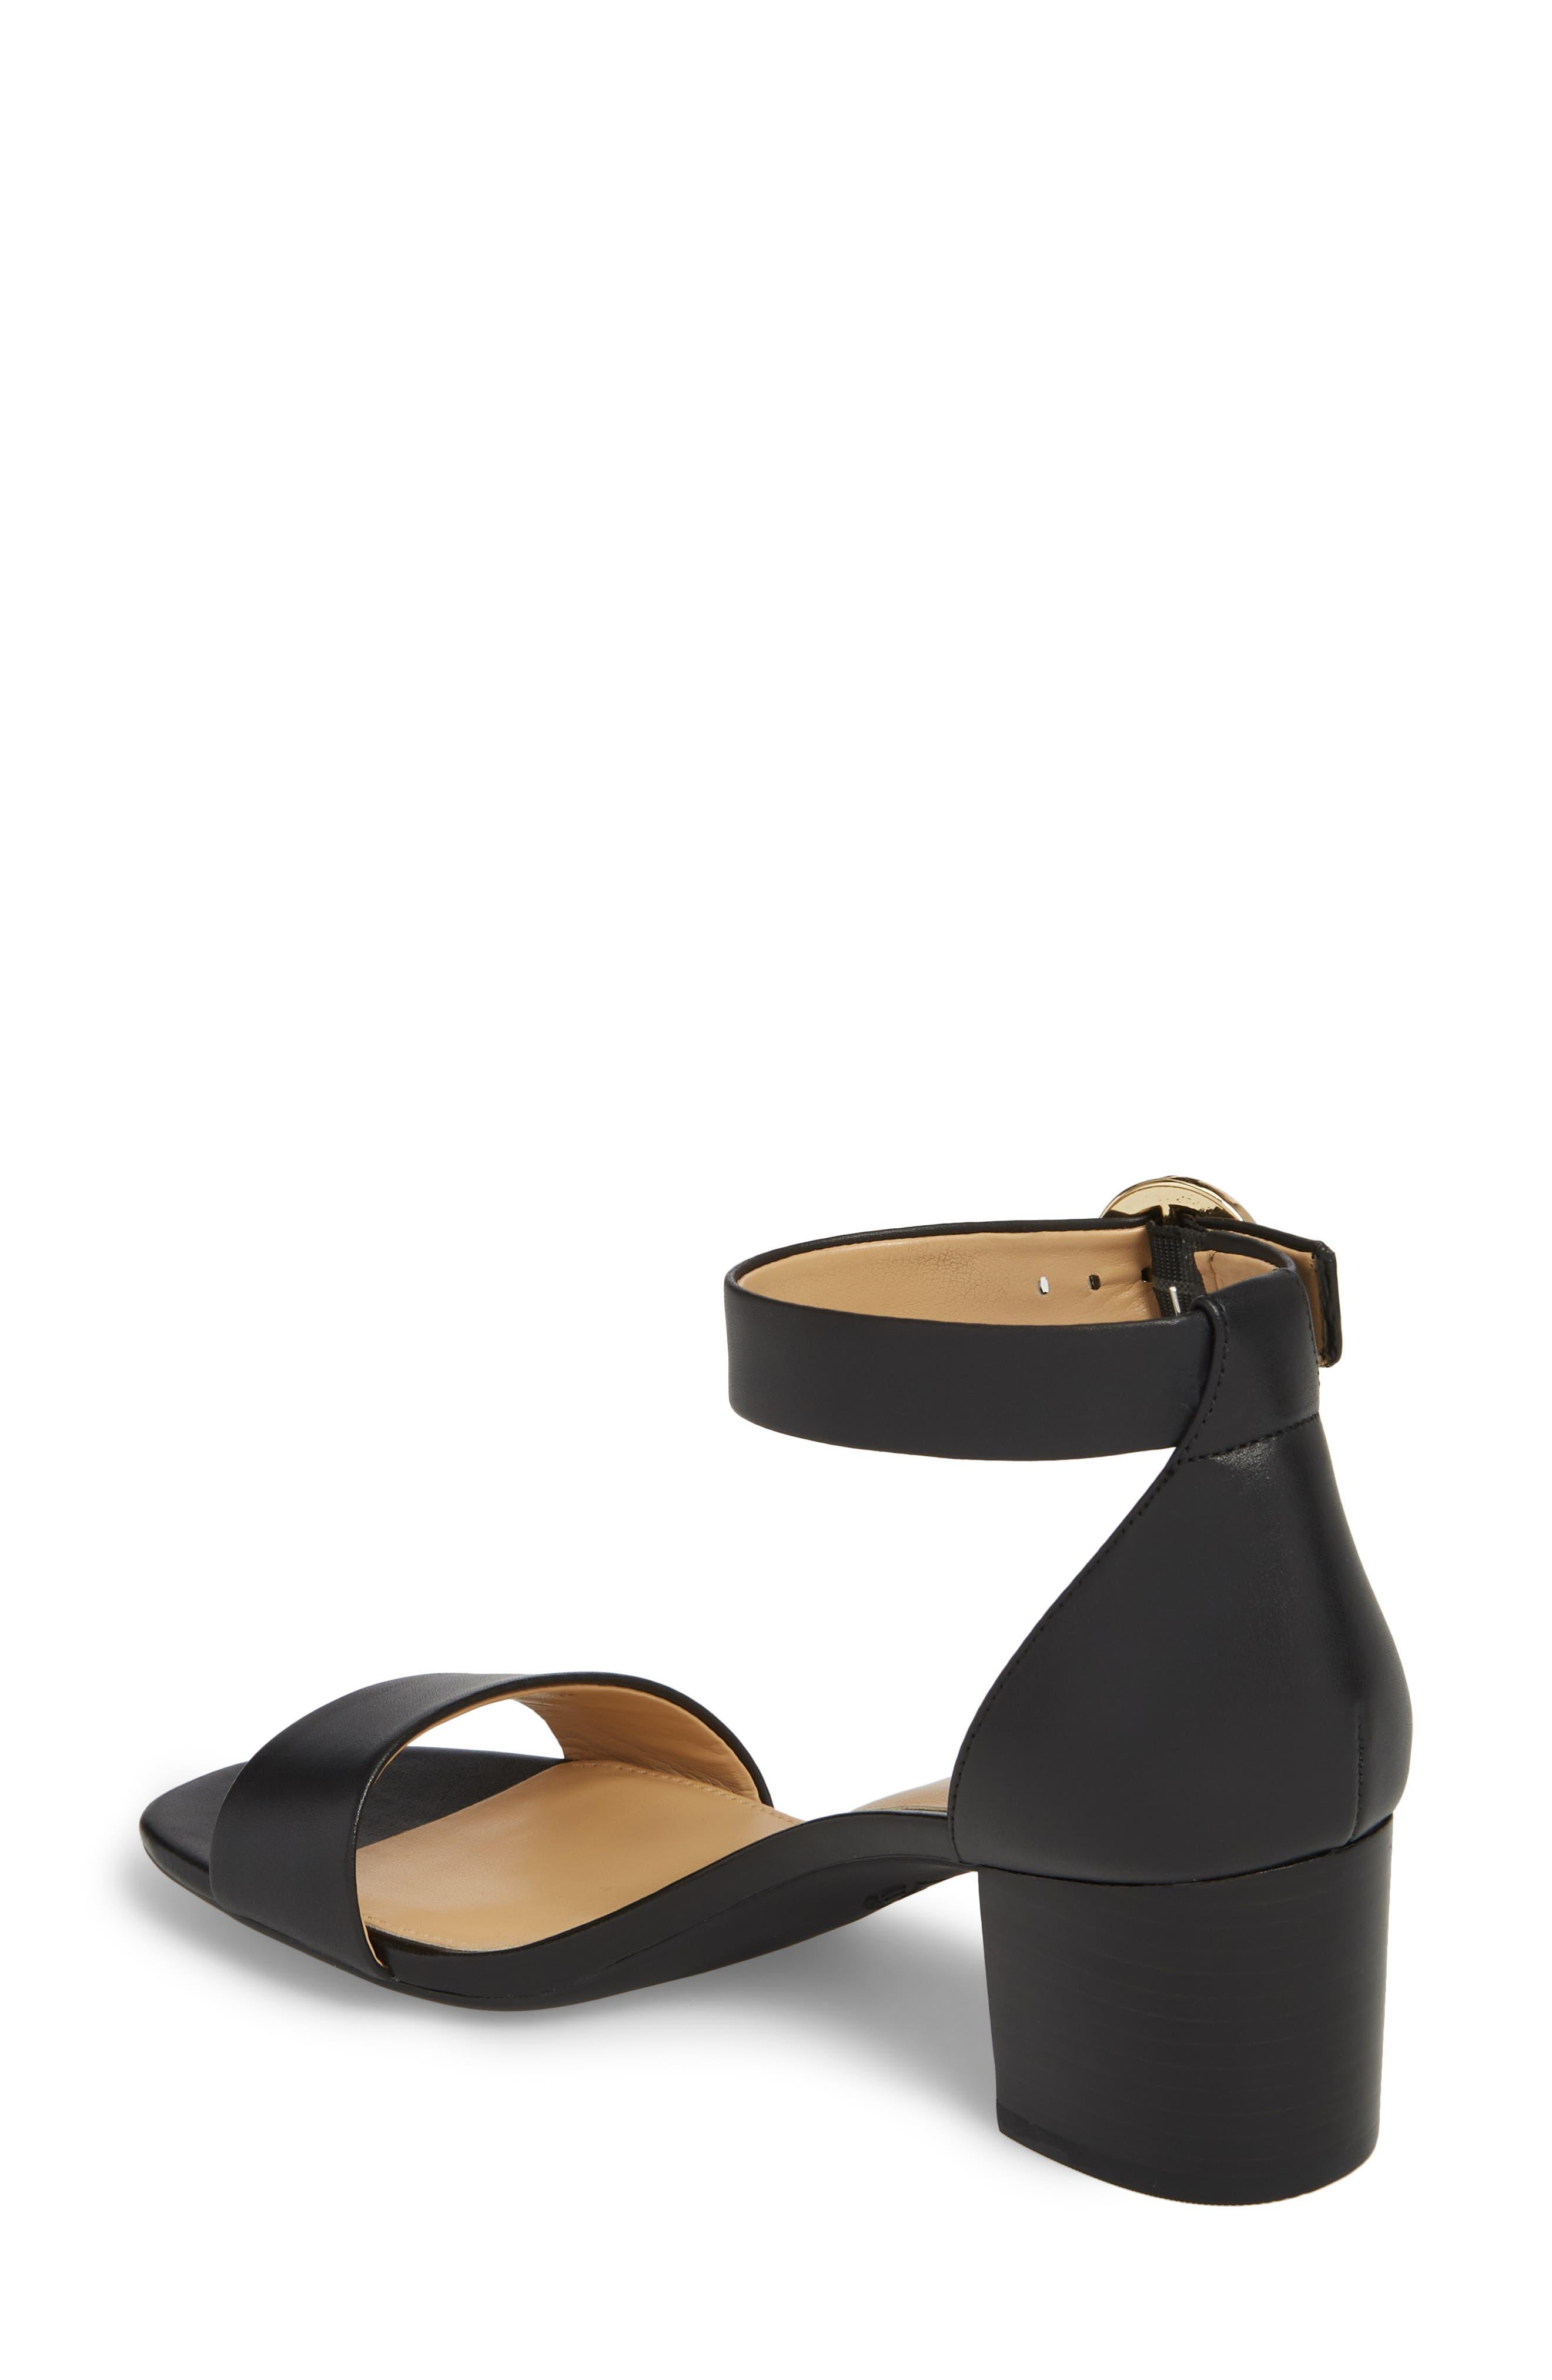 Lena Block Heel Sandal,                             Alternate thumbnail 2, color,                             BLACK